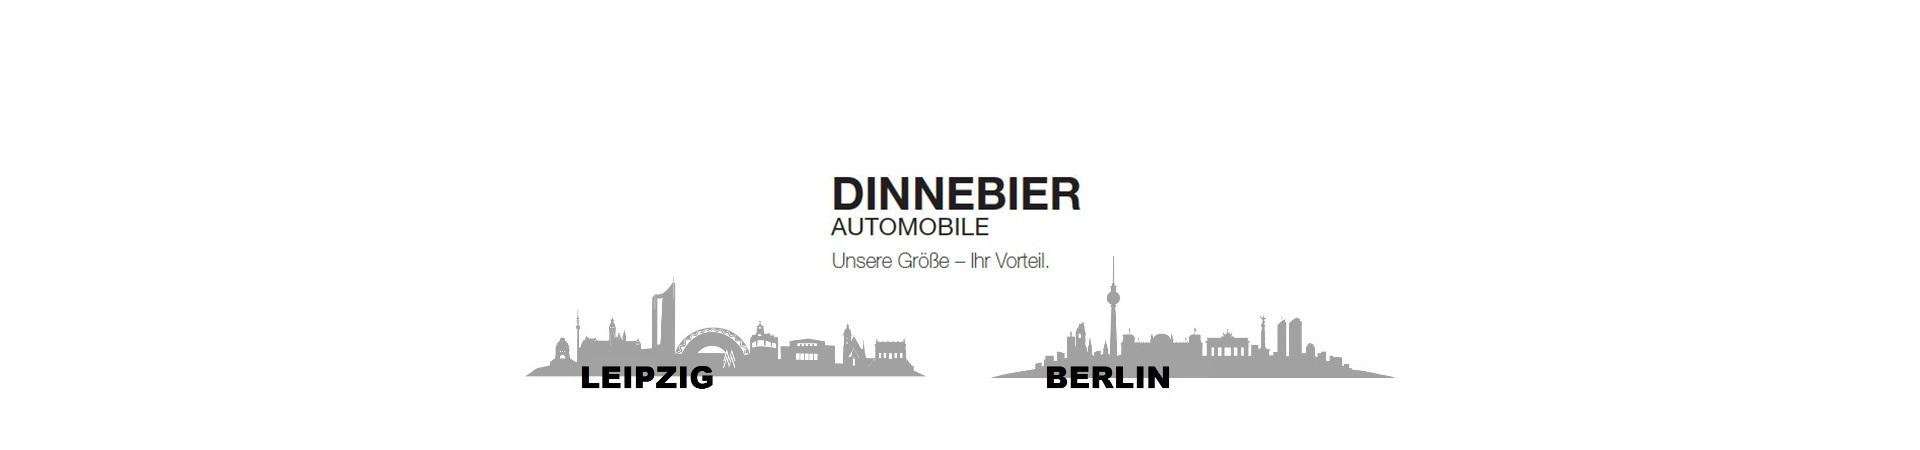 DINNEBIER AUTOMOBILE GMBH